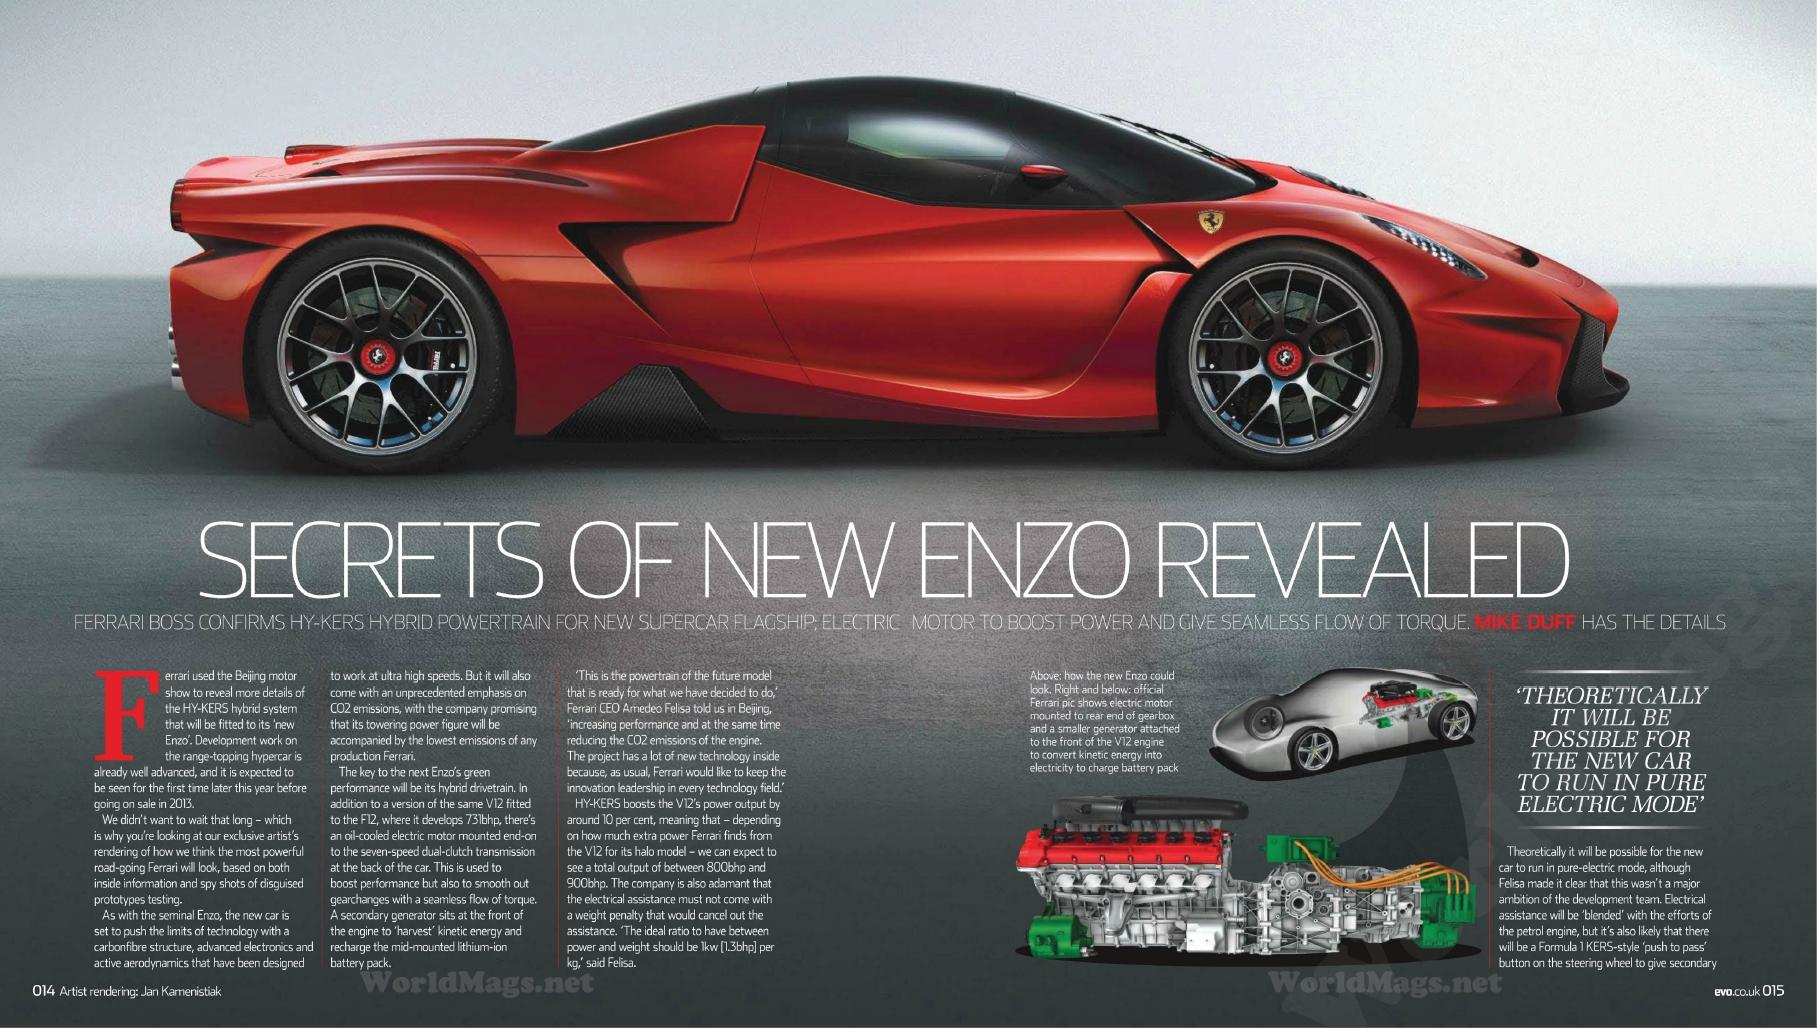 Revolutionary Design Ferrari F70 Ferrari S New Supercar